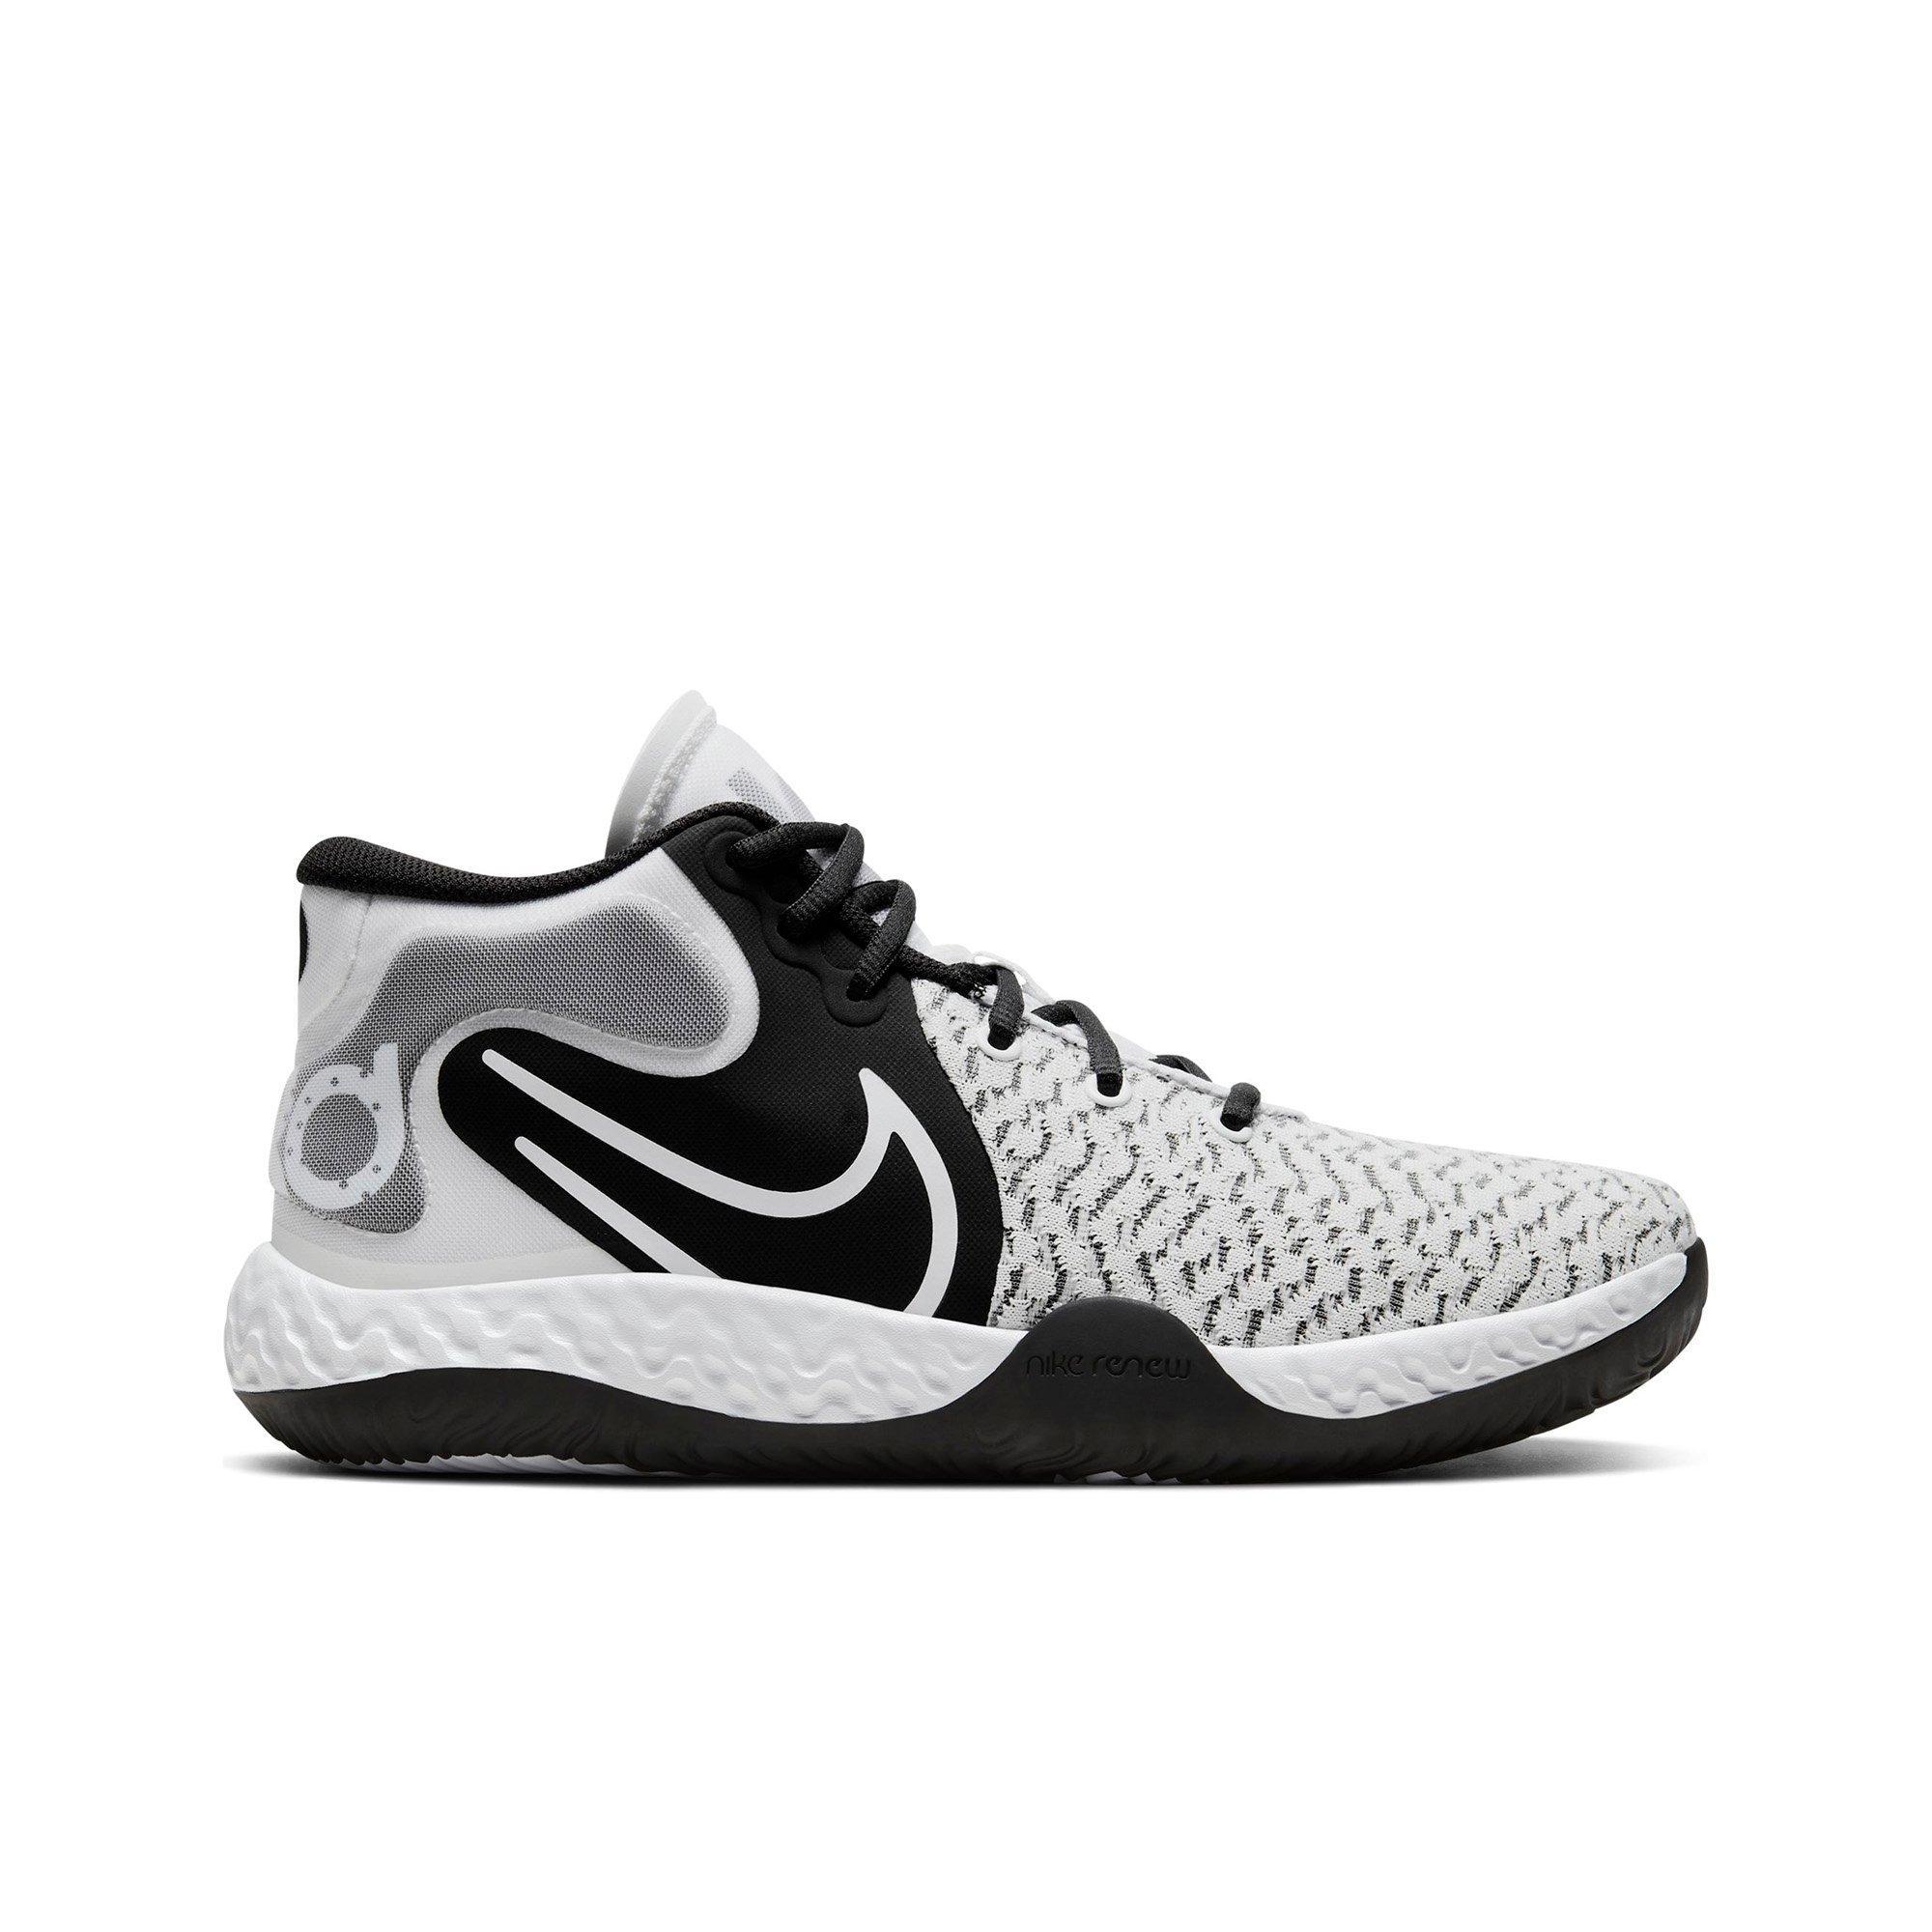 condón Golpe fuerte Razón  Nike KD Trey 5 VIII